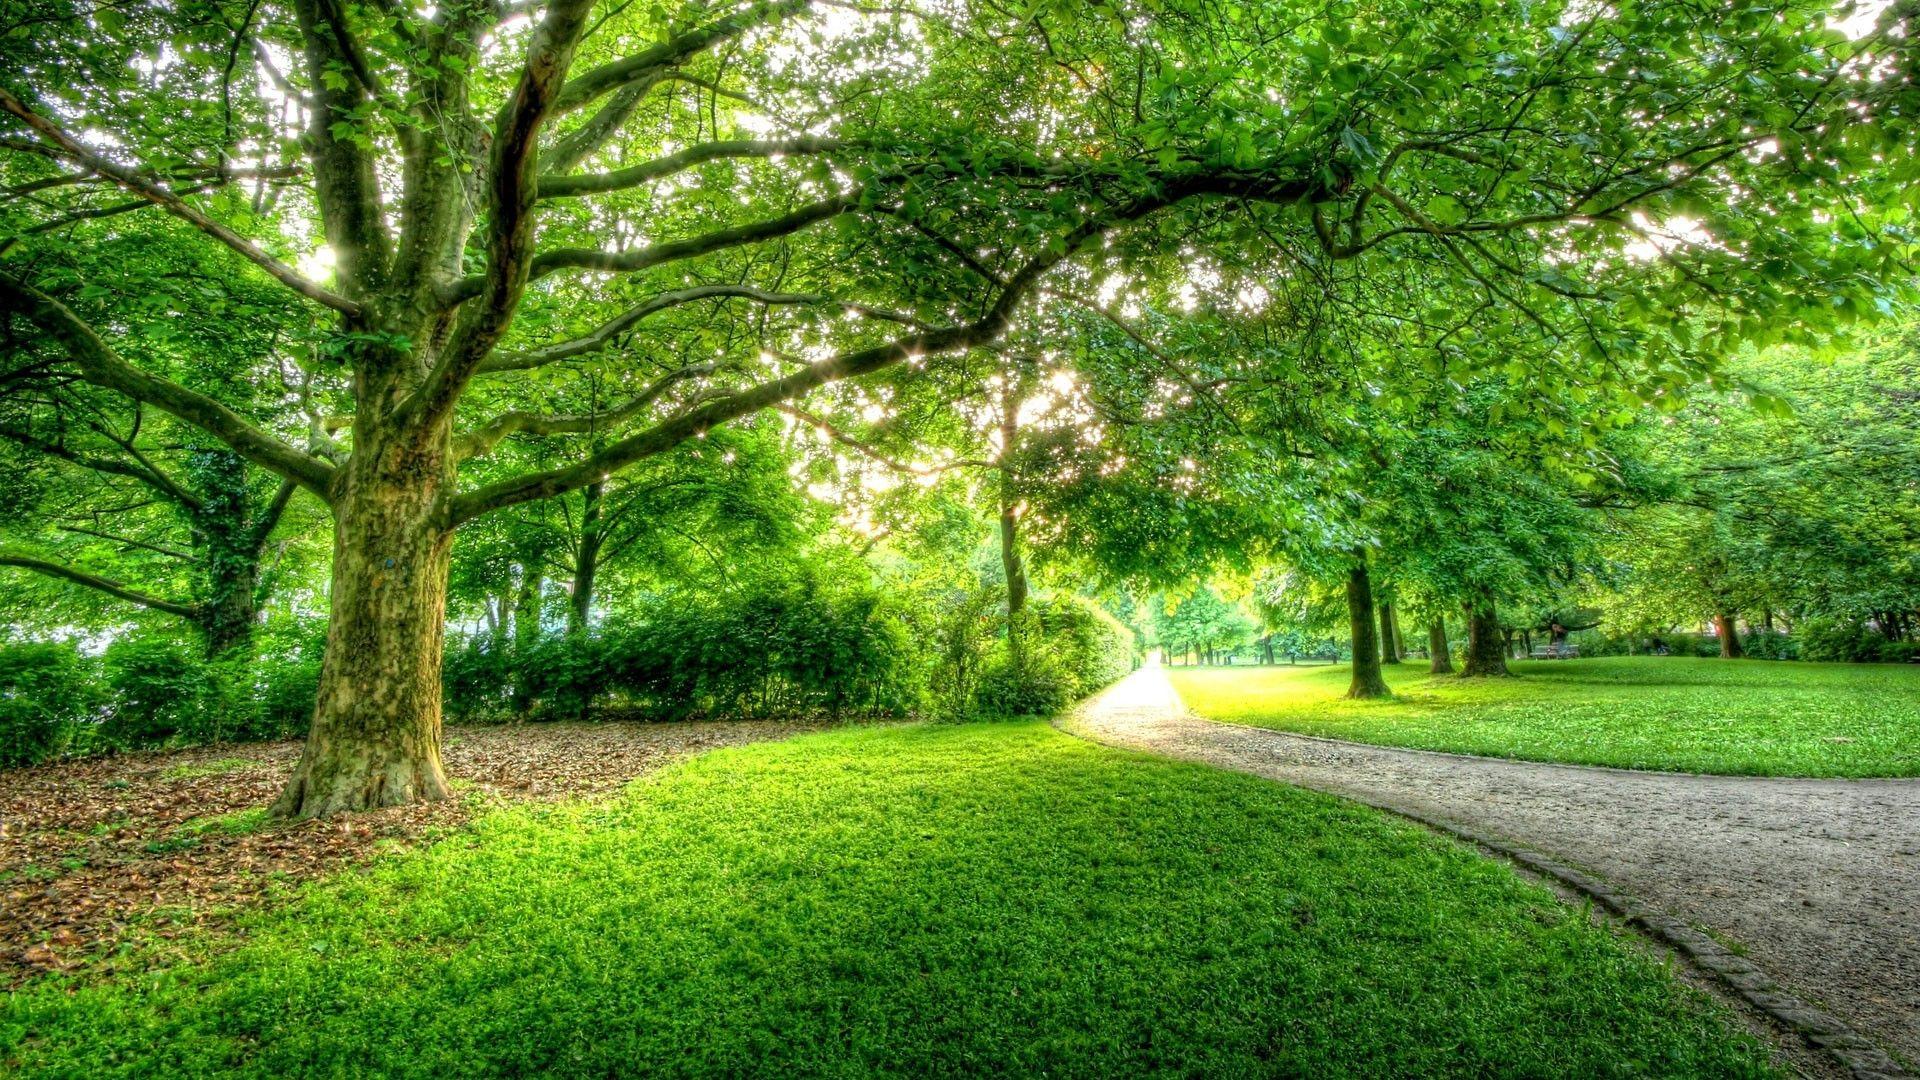 Beautiful Park In Berlin Hdr Hd Wallpaper 500726 Jpg 1920 1080